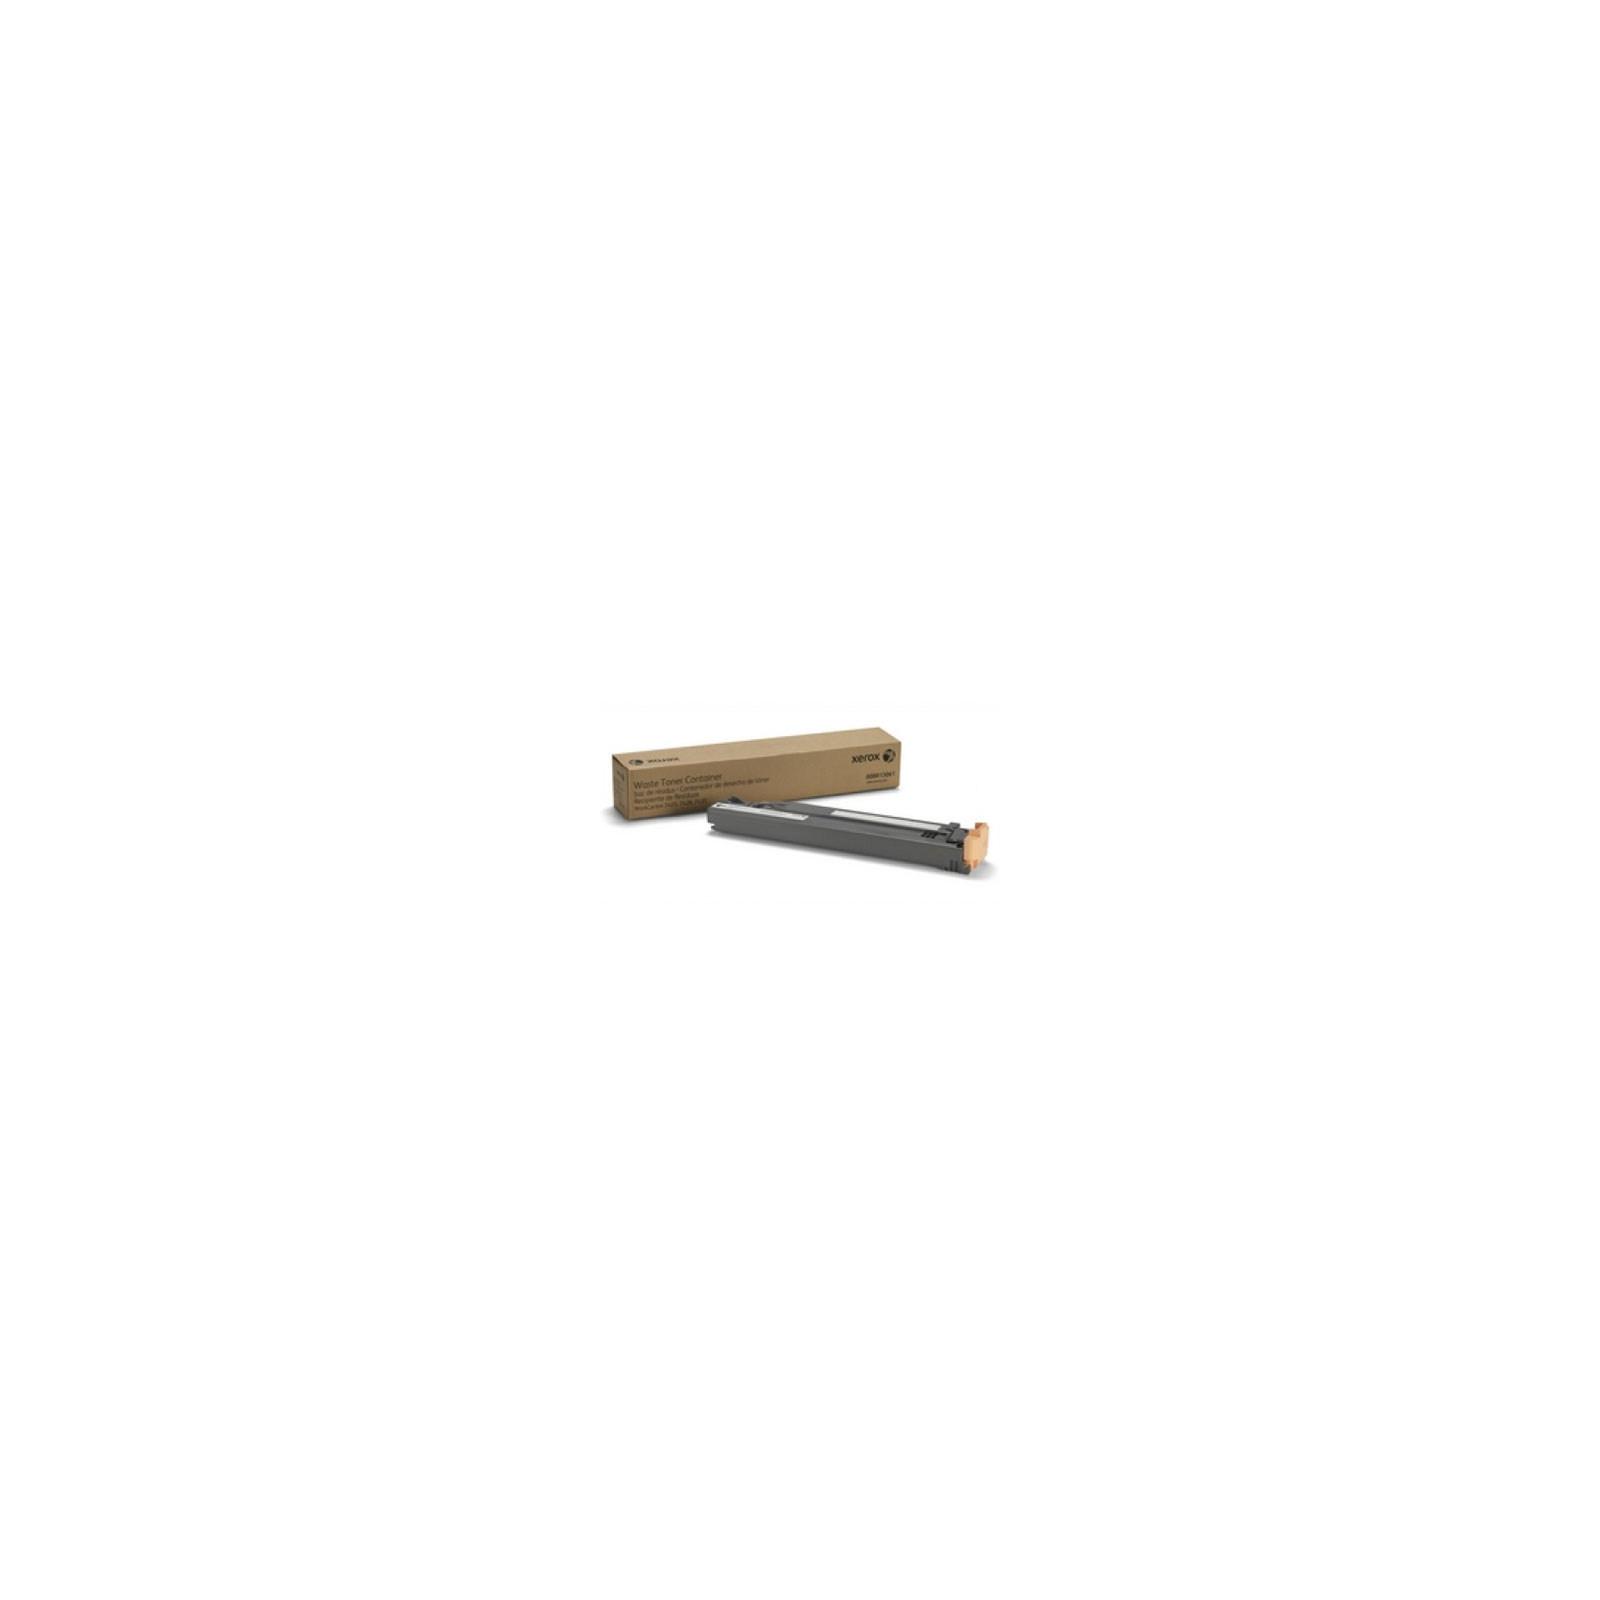 Сборник отработанного тонера XEROX WC7425/7428/35 (008R13061)